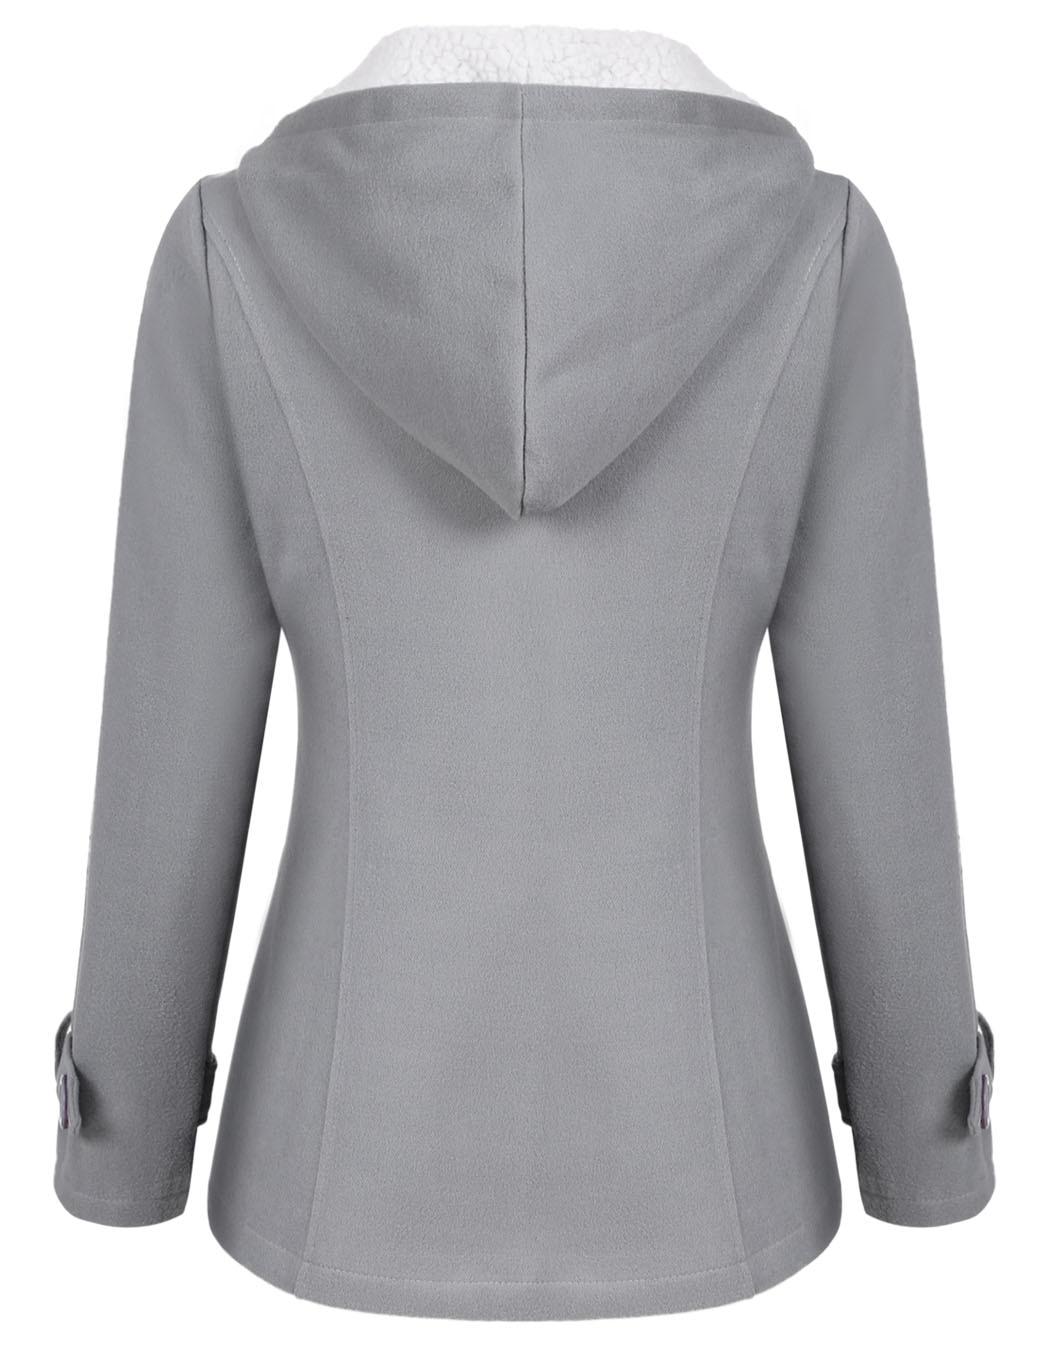 FANALA Coat Γυναικεία 2017 Φορέματα - Γυναικείος ρουχισμός - Φωτογραφία 6